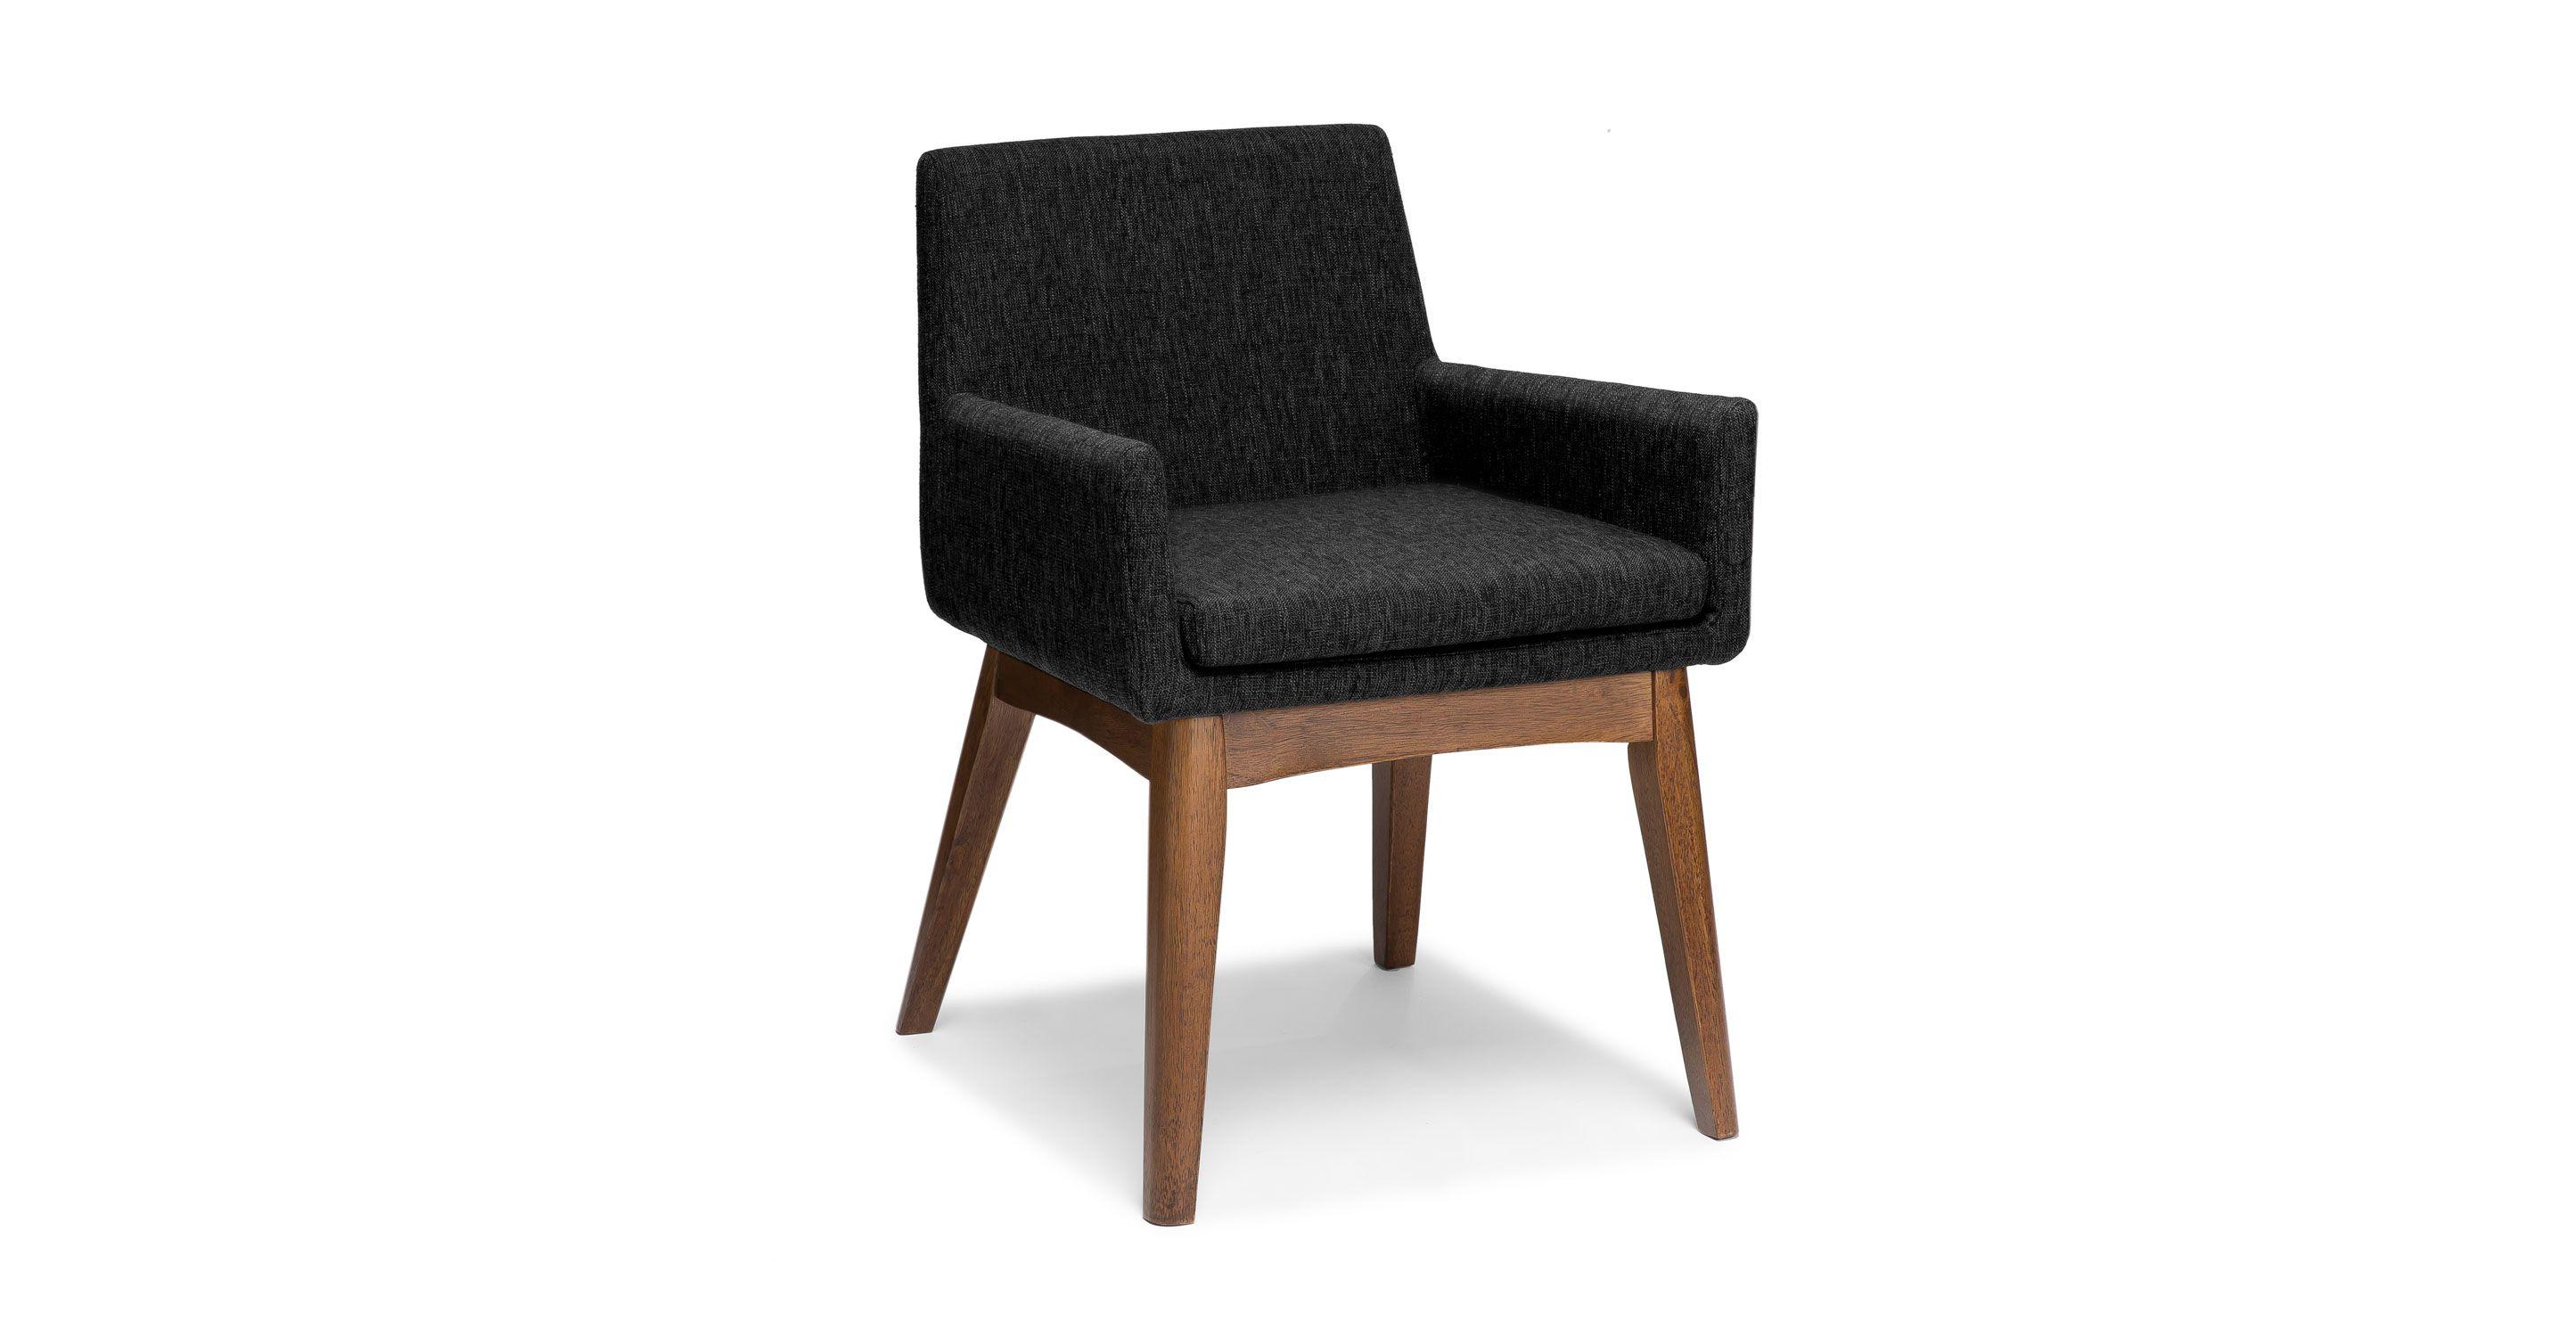 2 x Dark Gray Dining Armchair Solid Wood Legs